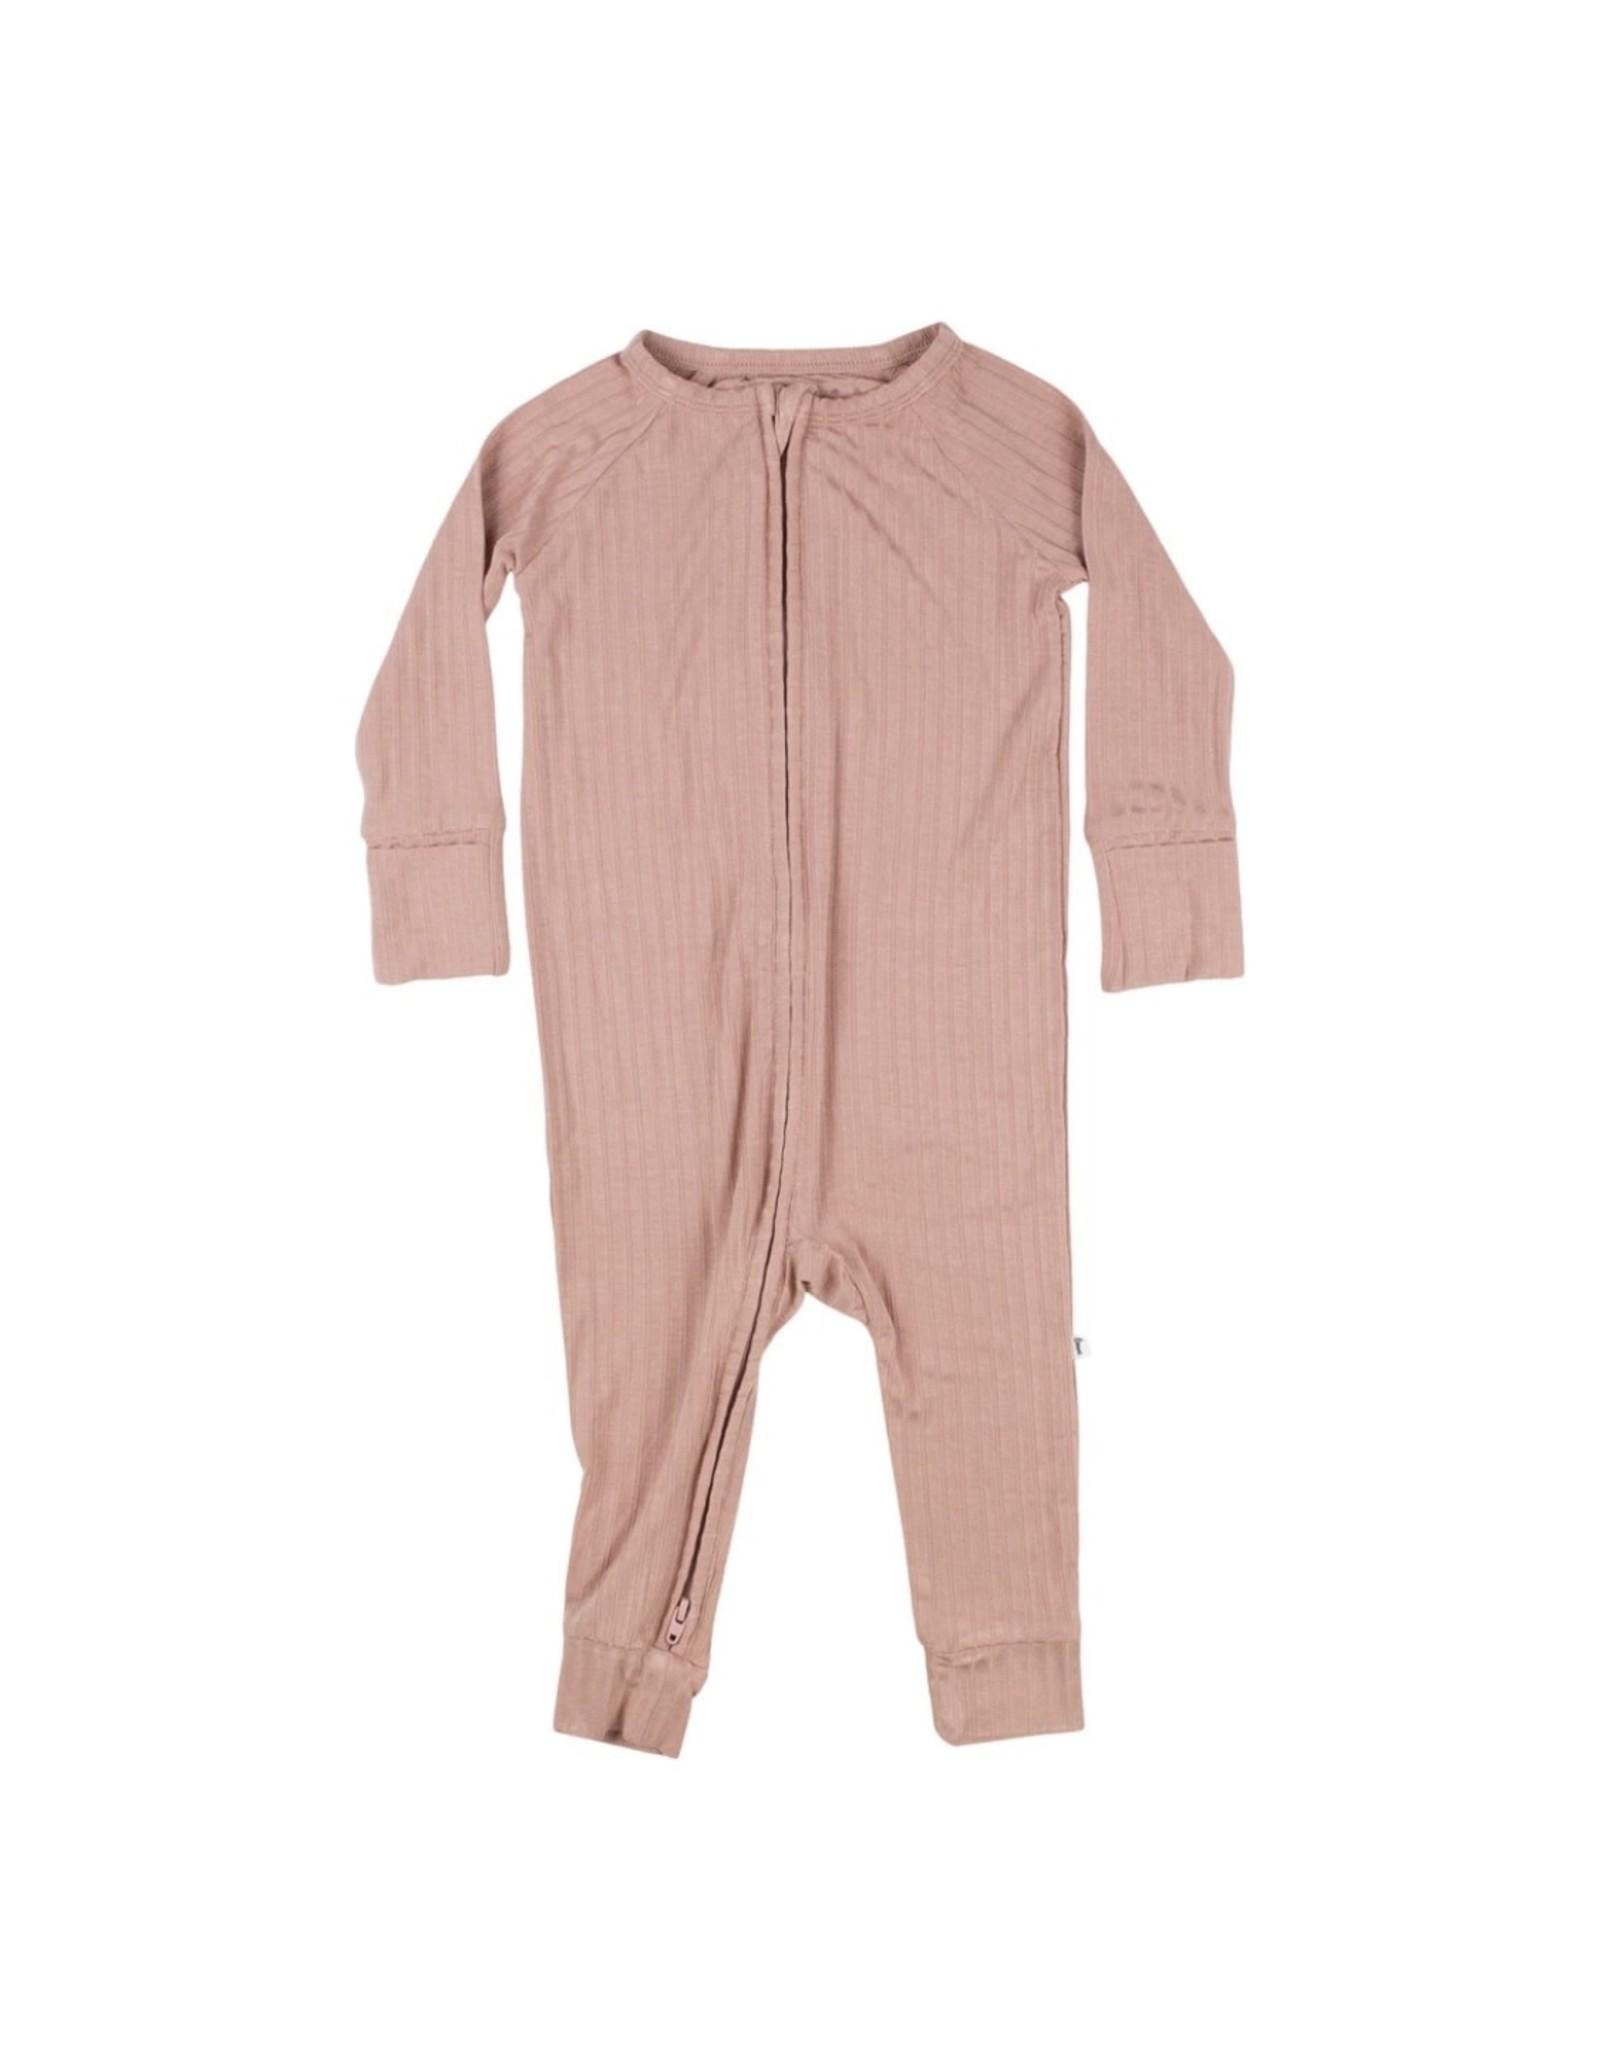 Brave Little Ones Brave Little Ones- Dusty Pink Ribbed Zip Romper